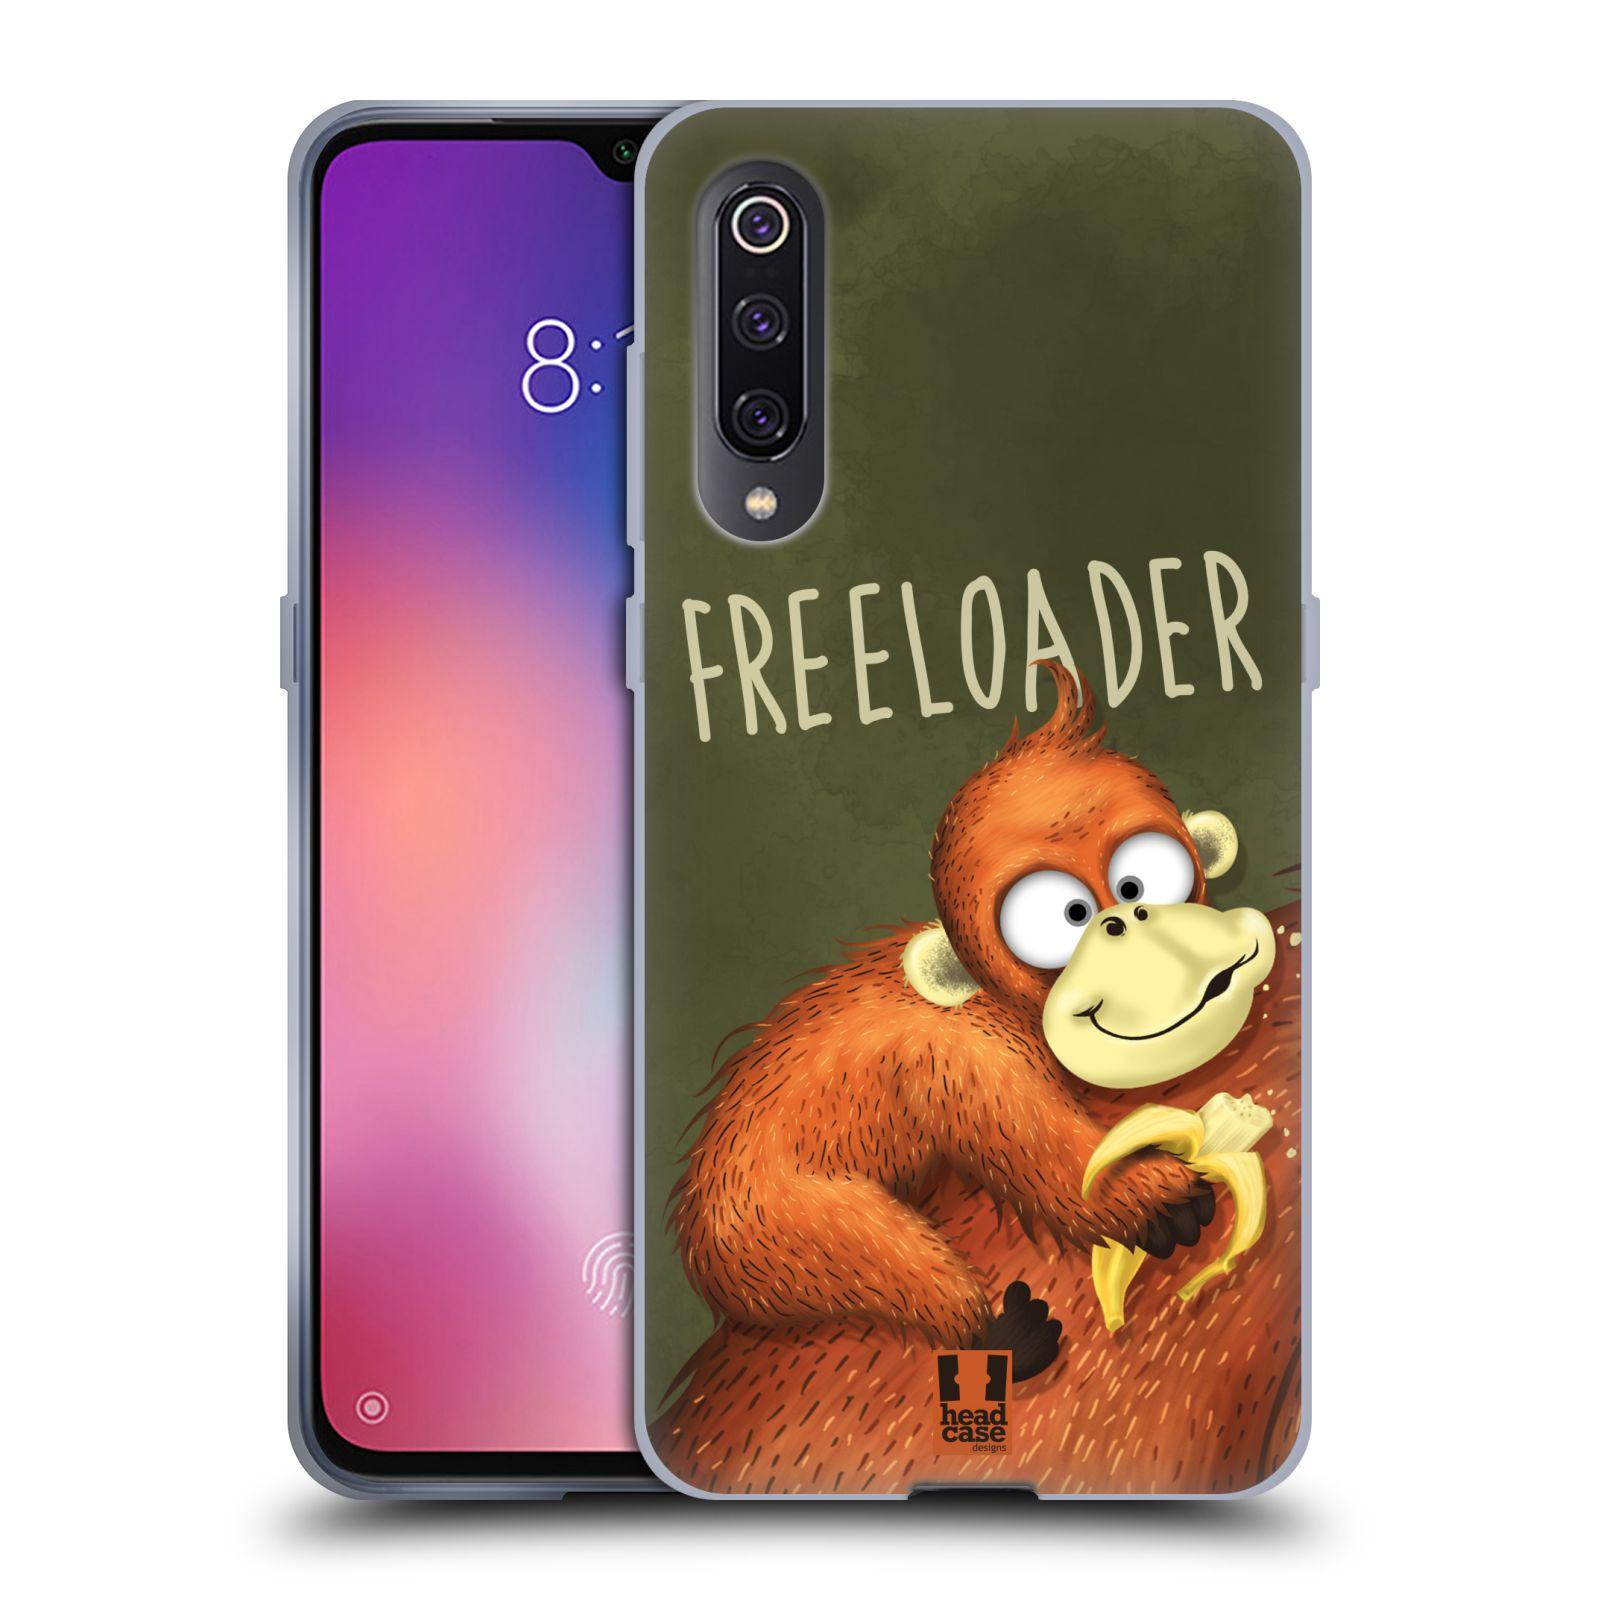 Silikonové pouzdro na mobil Xiaomi Mi 9 - Head Case - Opičák Freeloader